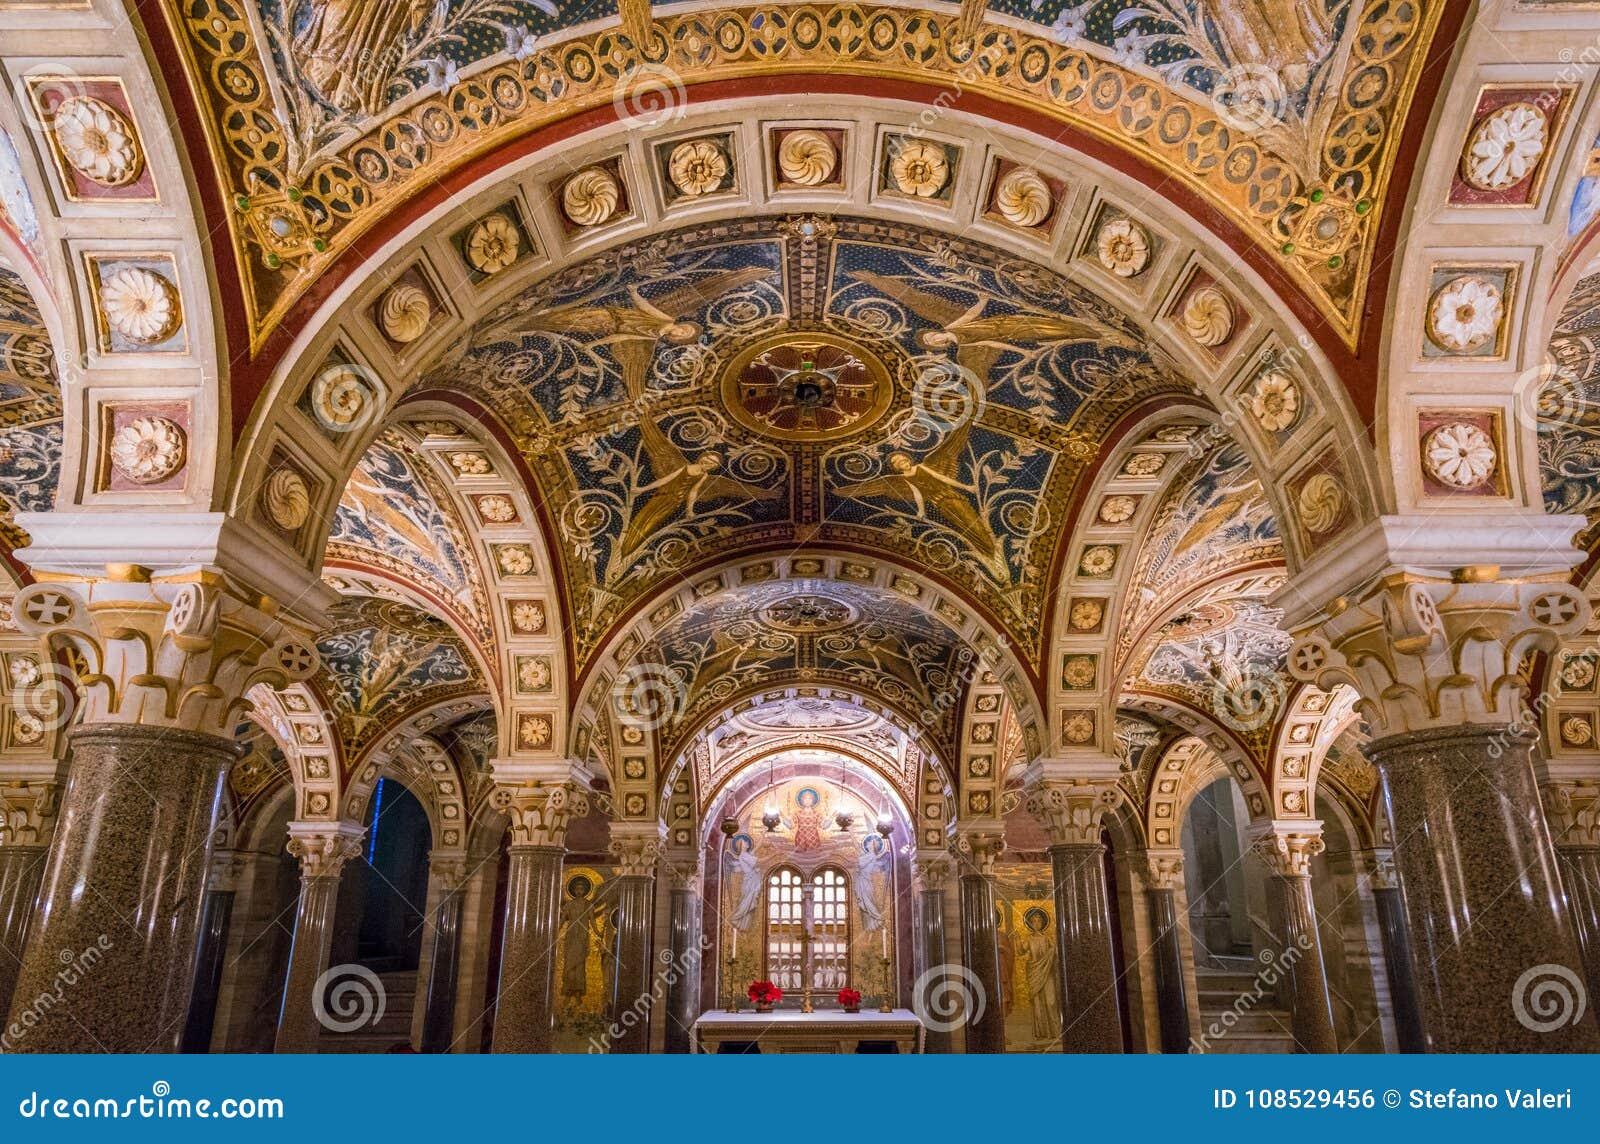 The crypt of Santa Cecilia in Trastevere Church in Rome, Italy.